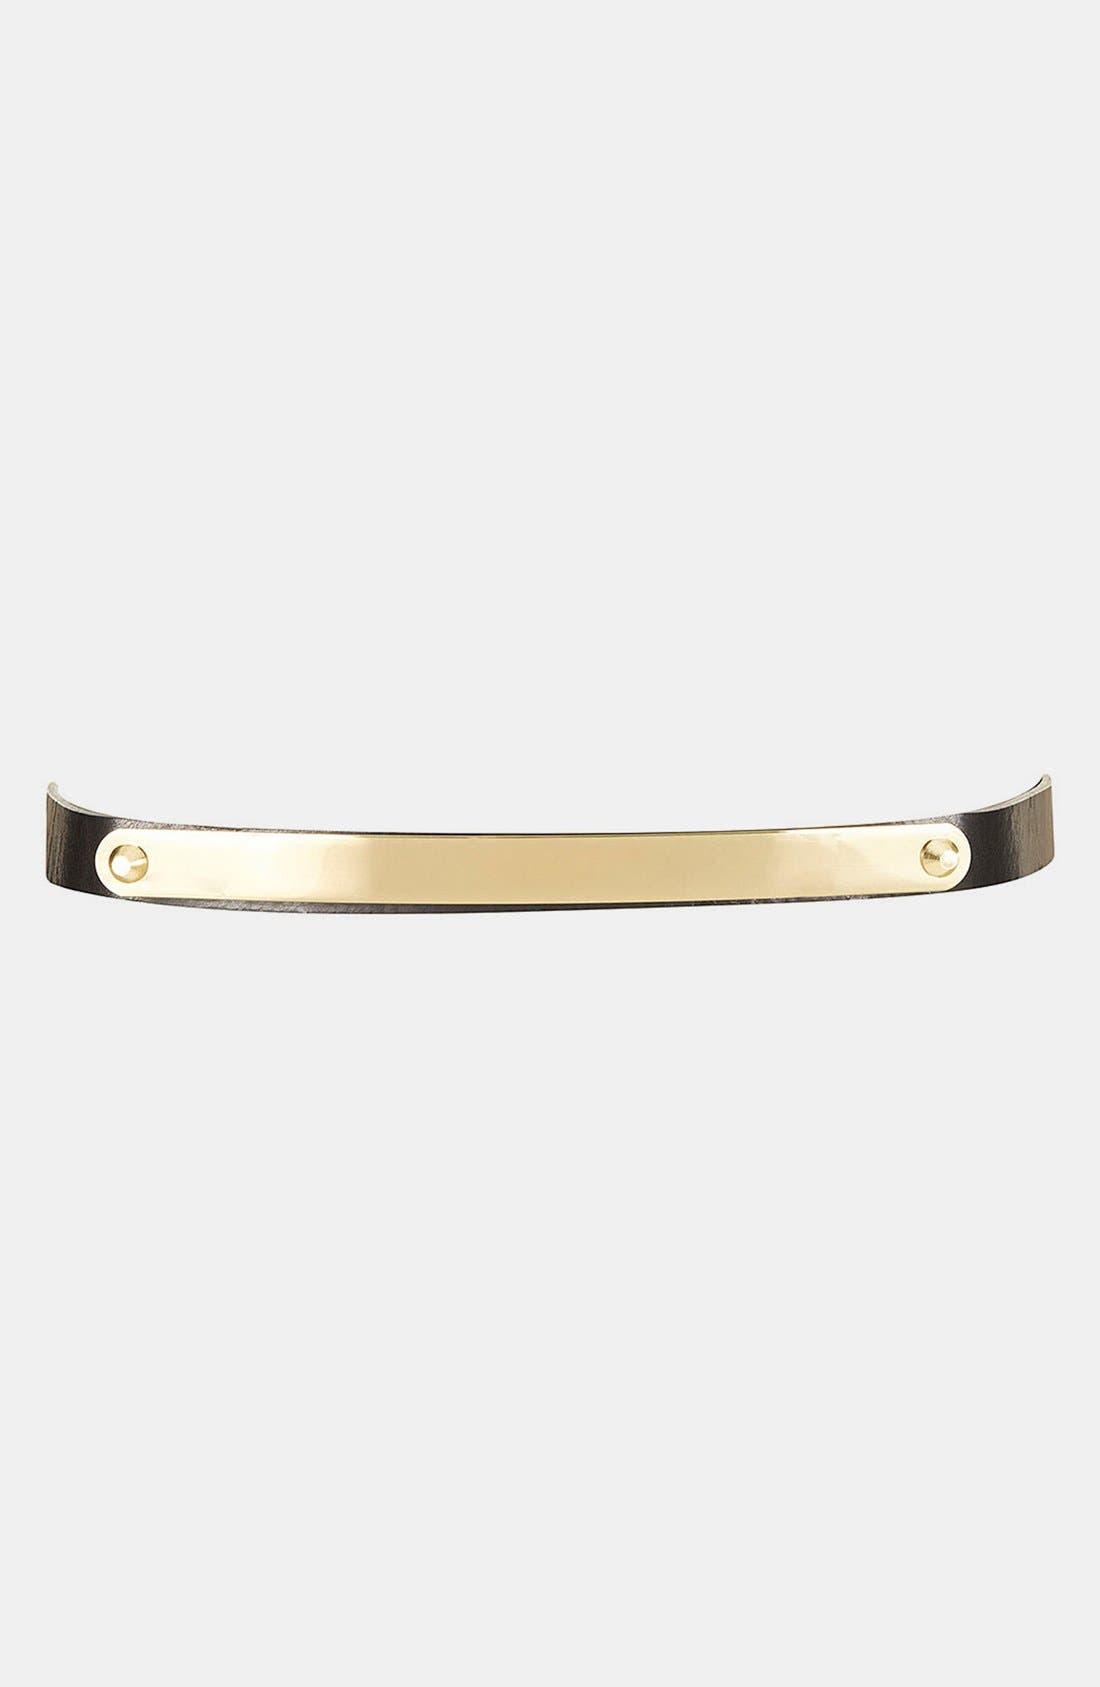 Alternate Image 1 Selected - Topshop 'Clean Metal Bar' Skinny Belt